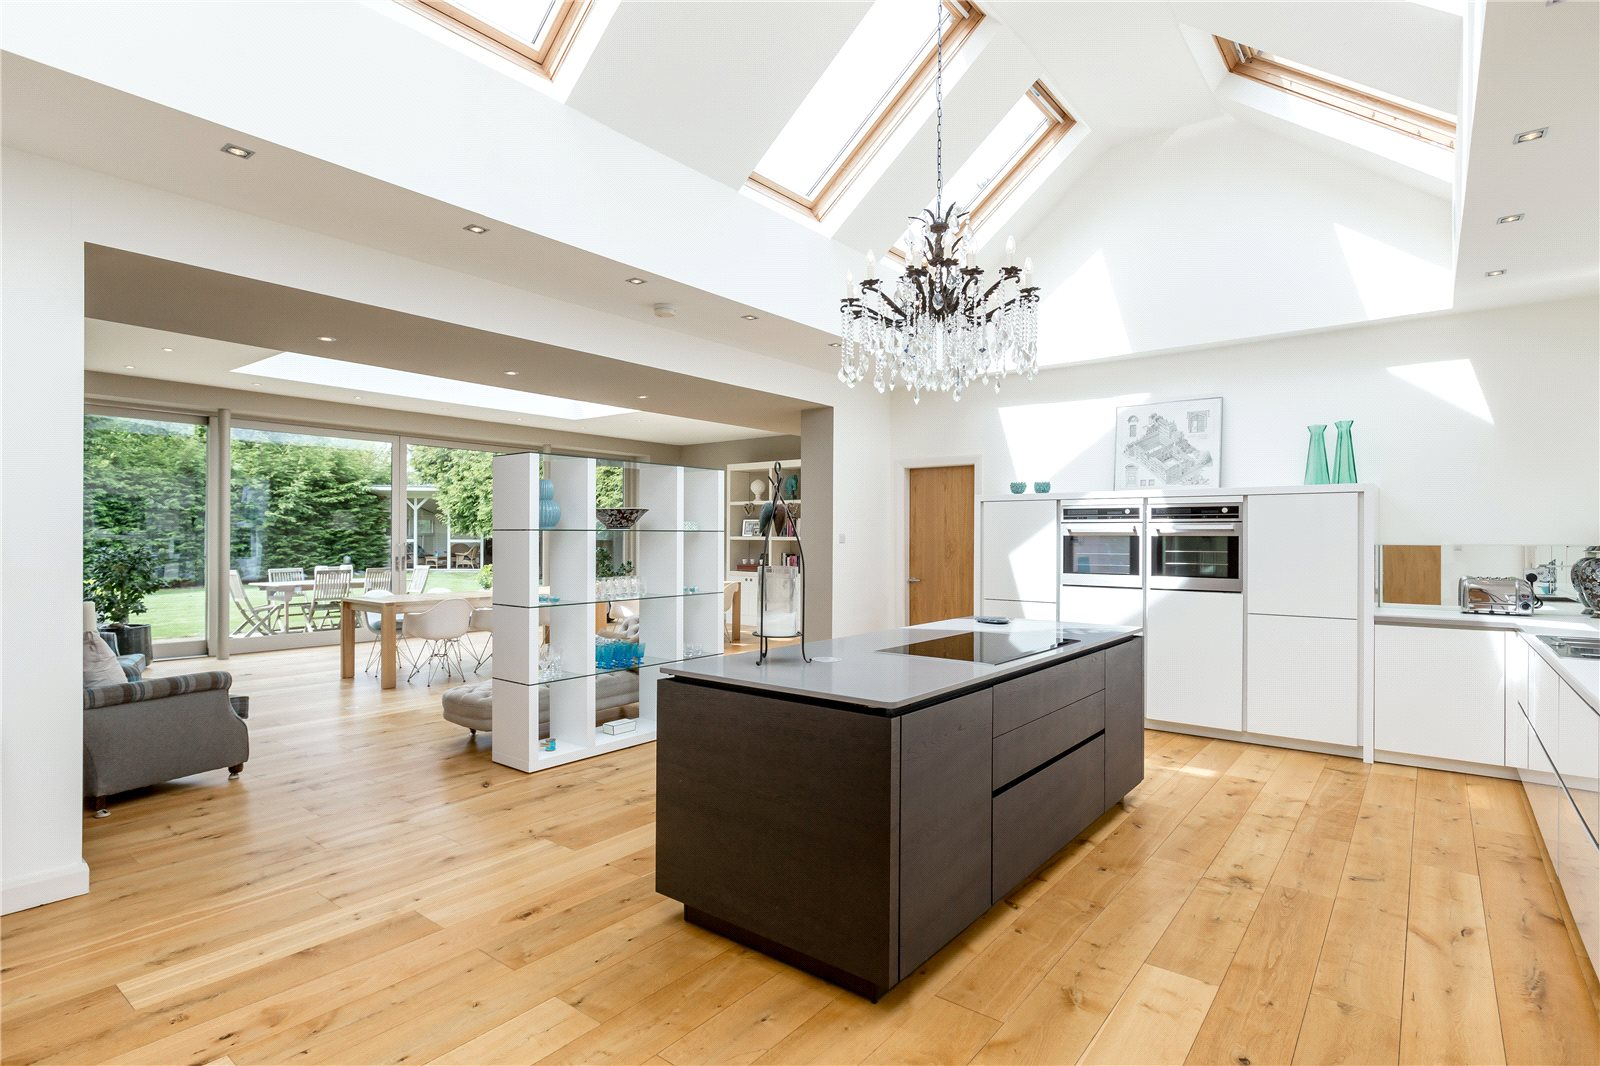 Single Family Home for Sale at Barnton Avenue West, Edinburgh, EH4 Edinburgh, Scotland